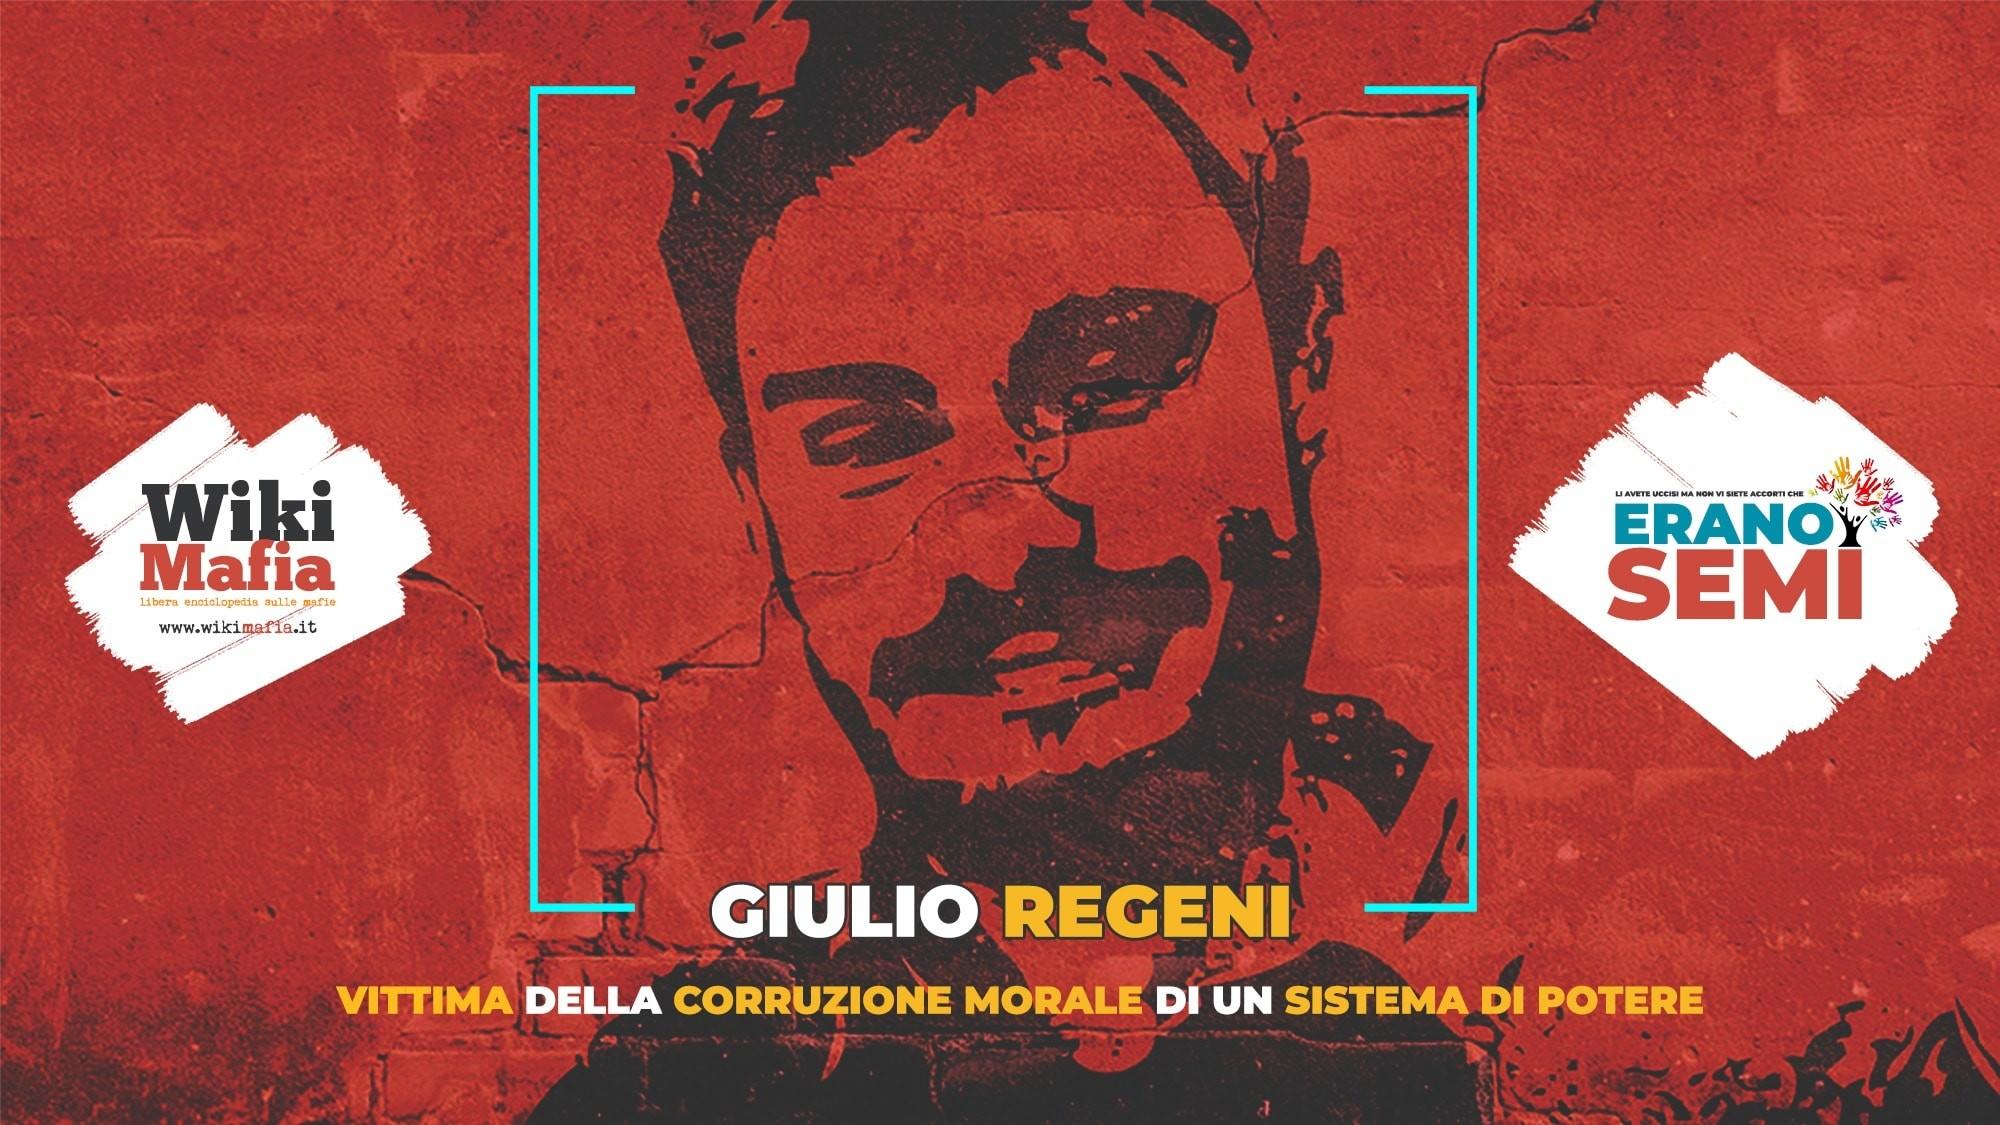 Giulio Regeni WikiMafia